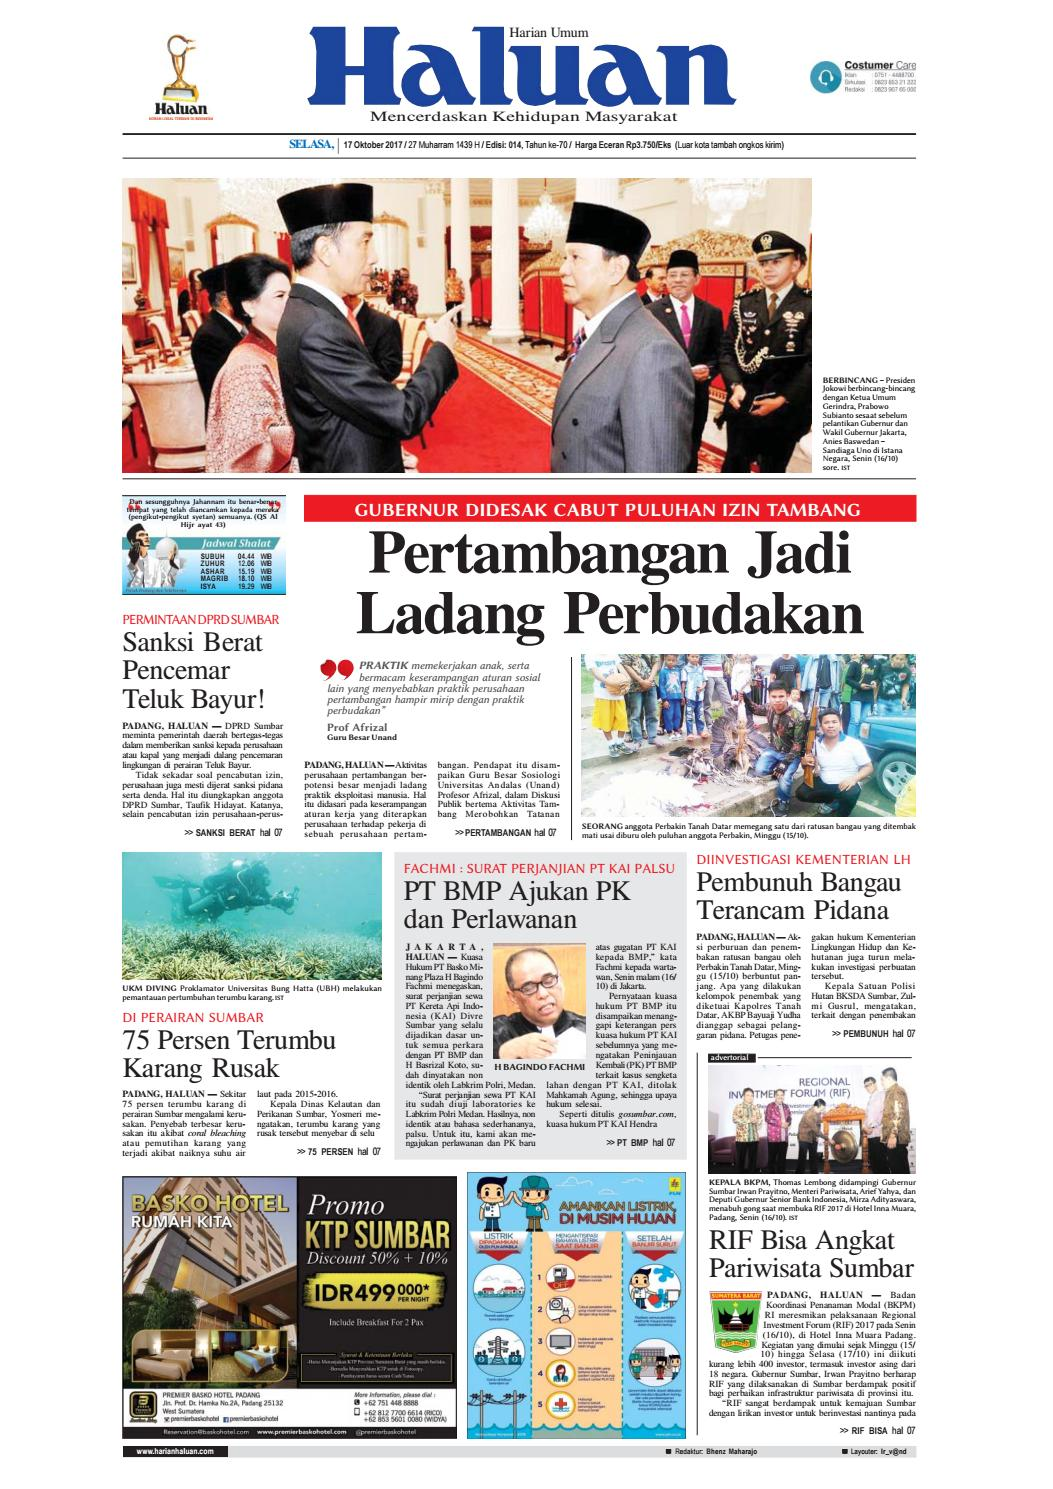 Haluan 17 Oktober 2017 By Harian Issuu Produk Ukm Bumn Nomor Rumah Motif Apel